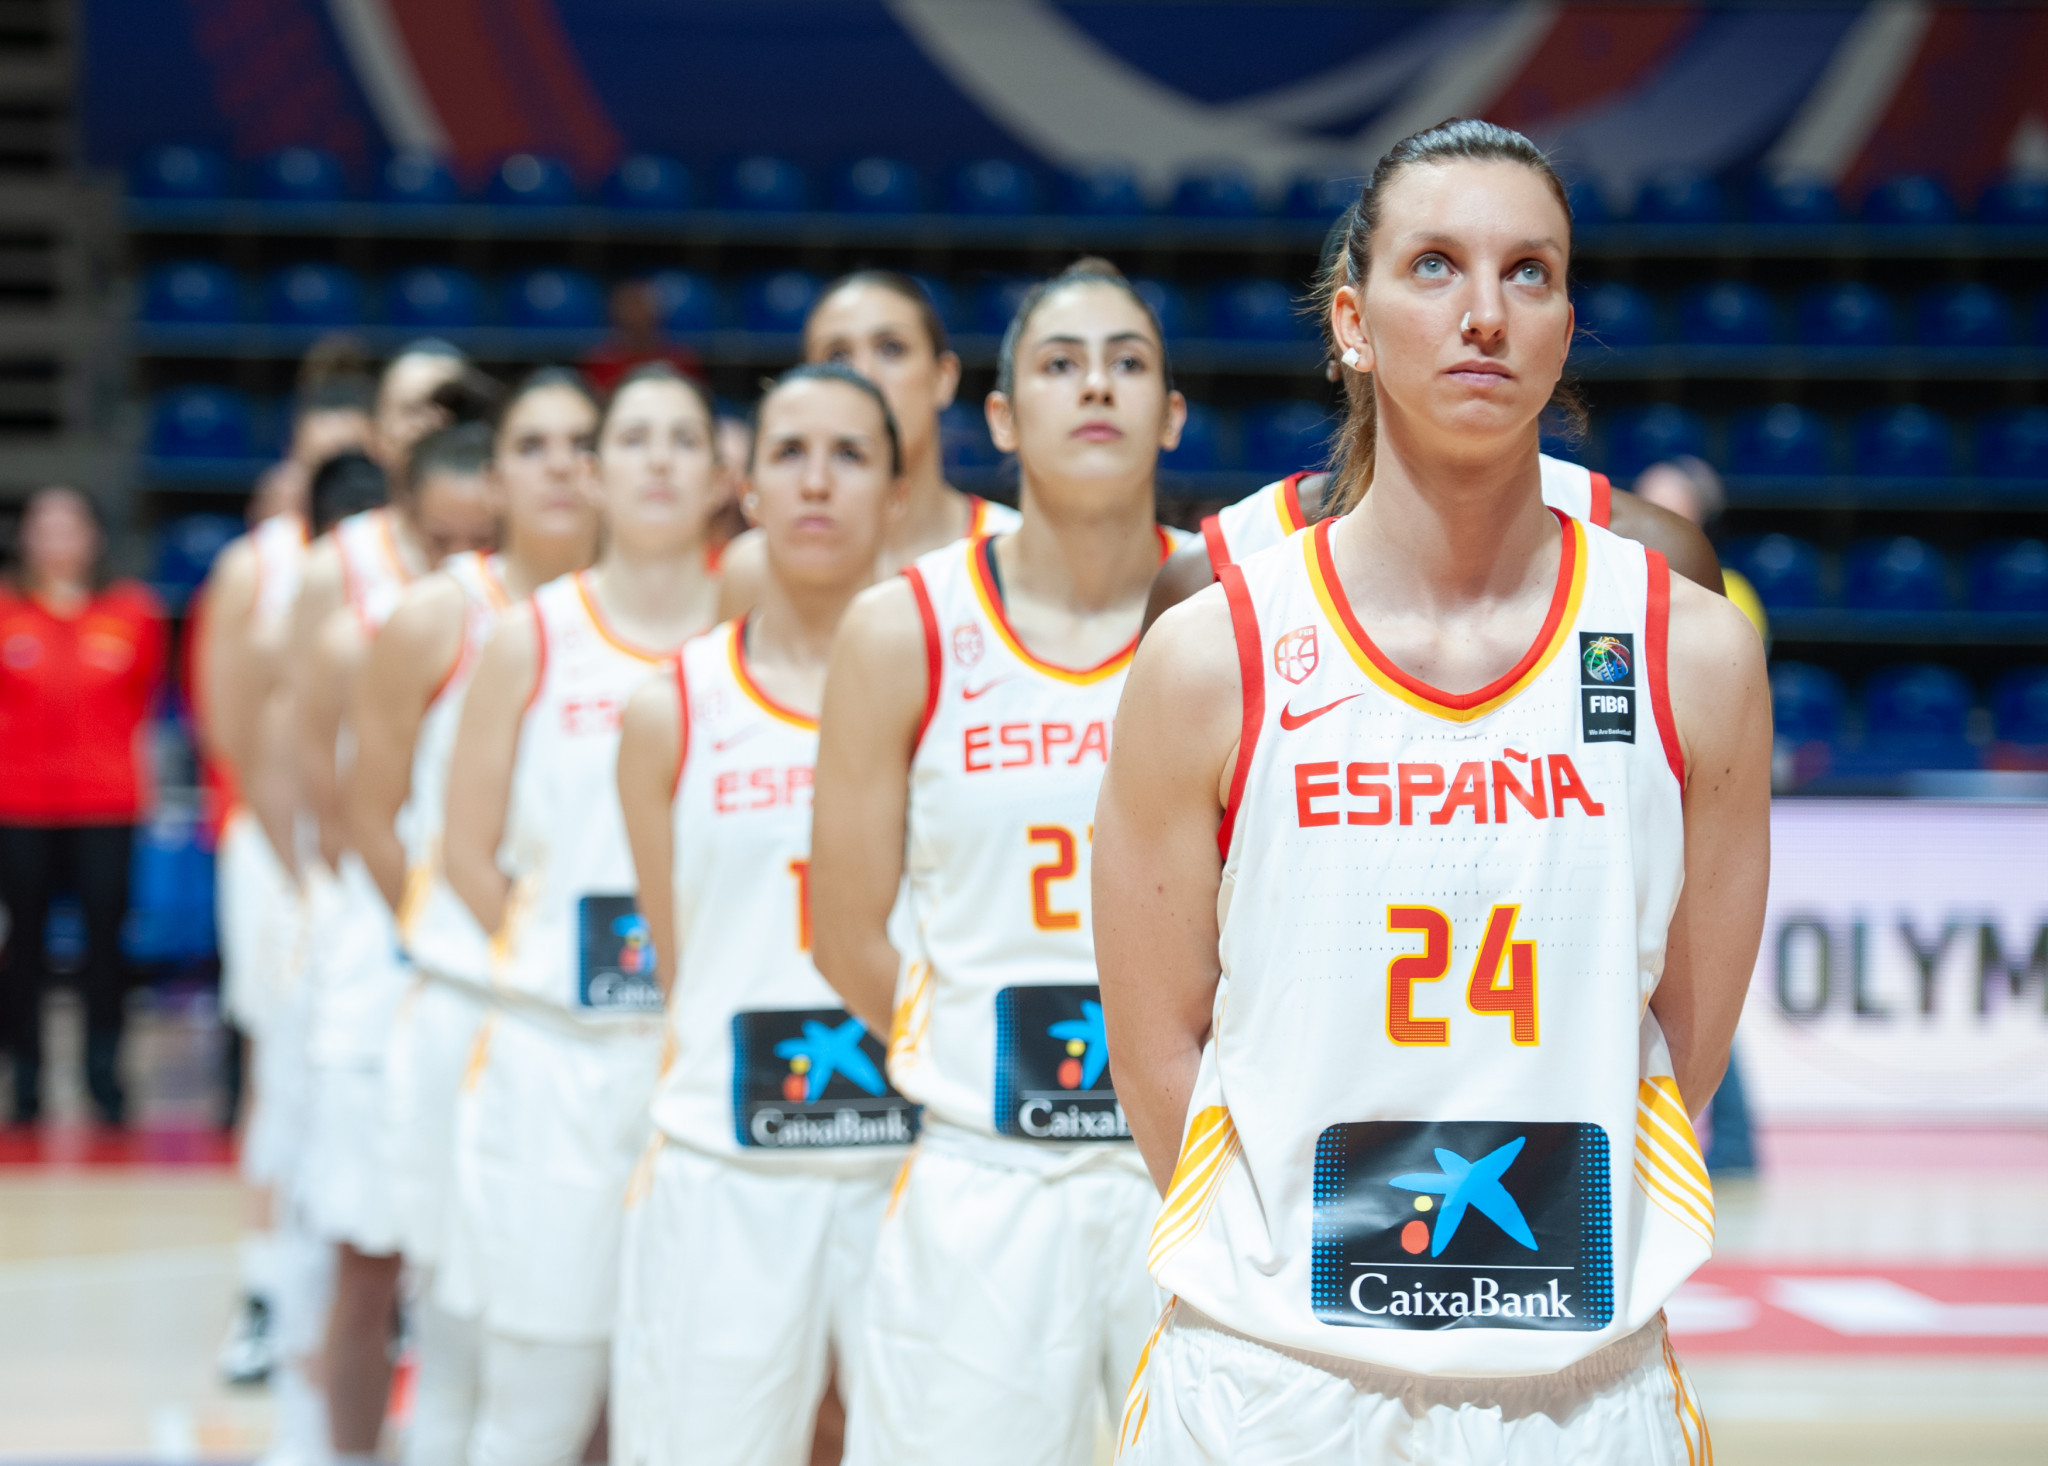 Spain target third straight FIBA Women's EuroBasket title